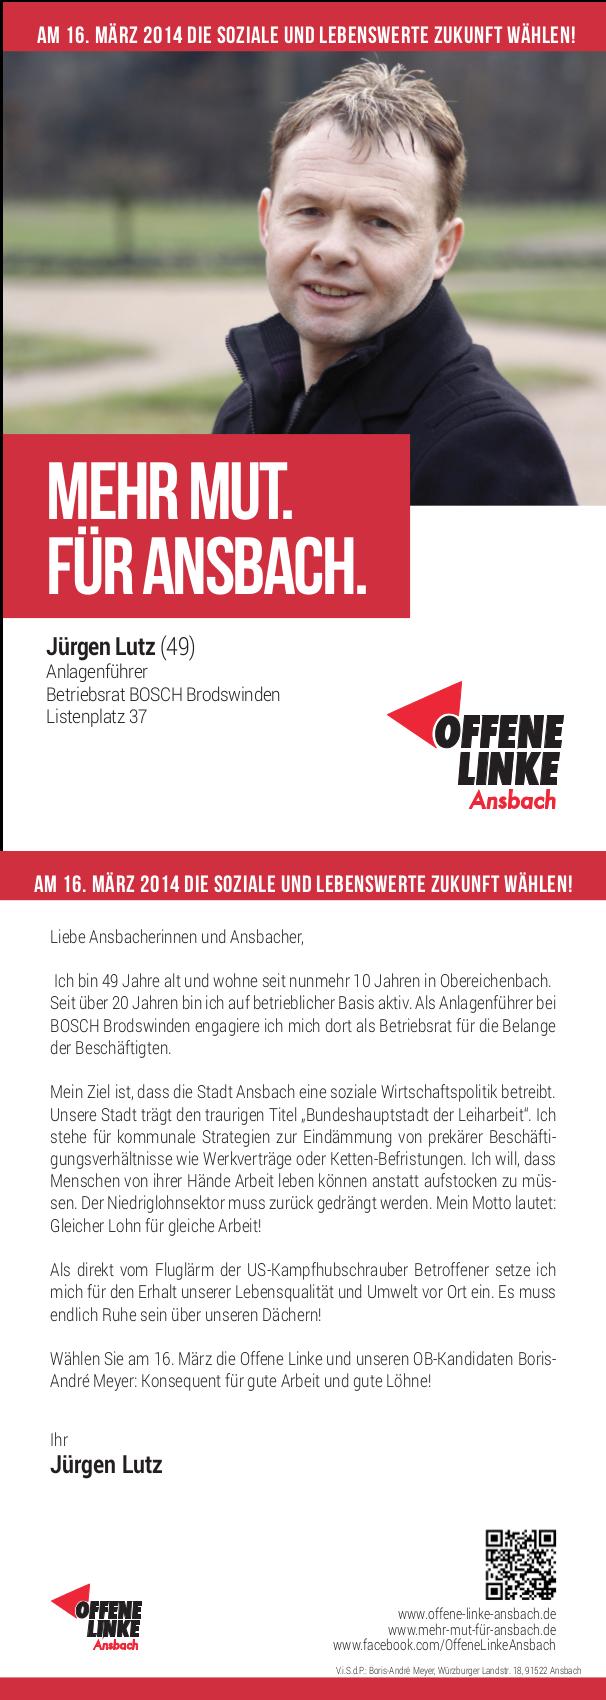 Jürgen_Lutz